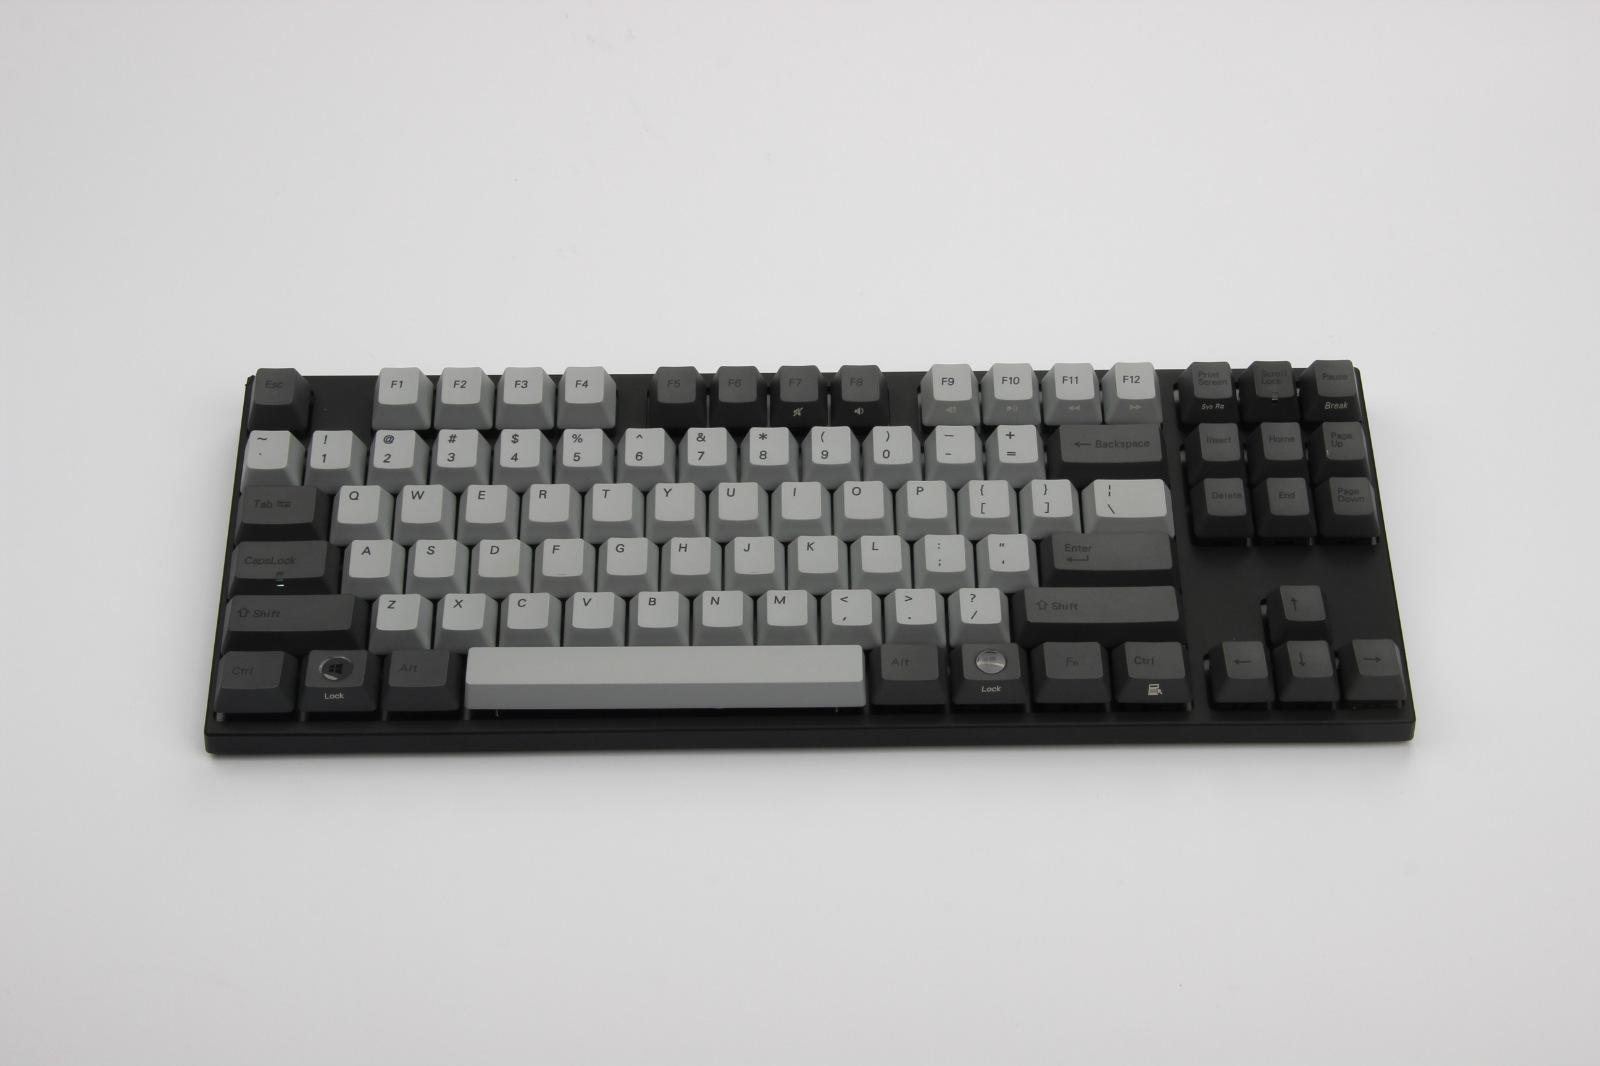 Varmilo Vb87m Bluetooth Mechanical Keyboard Mx Cherry